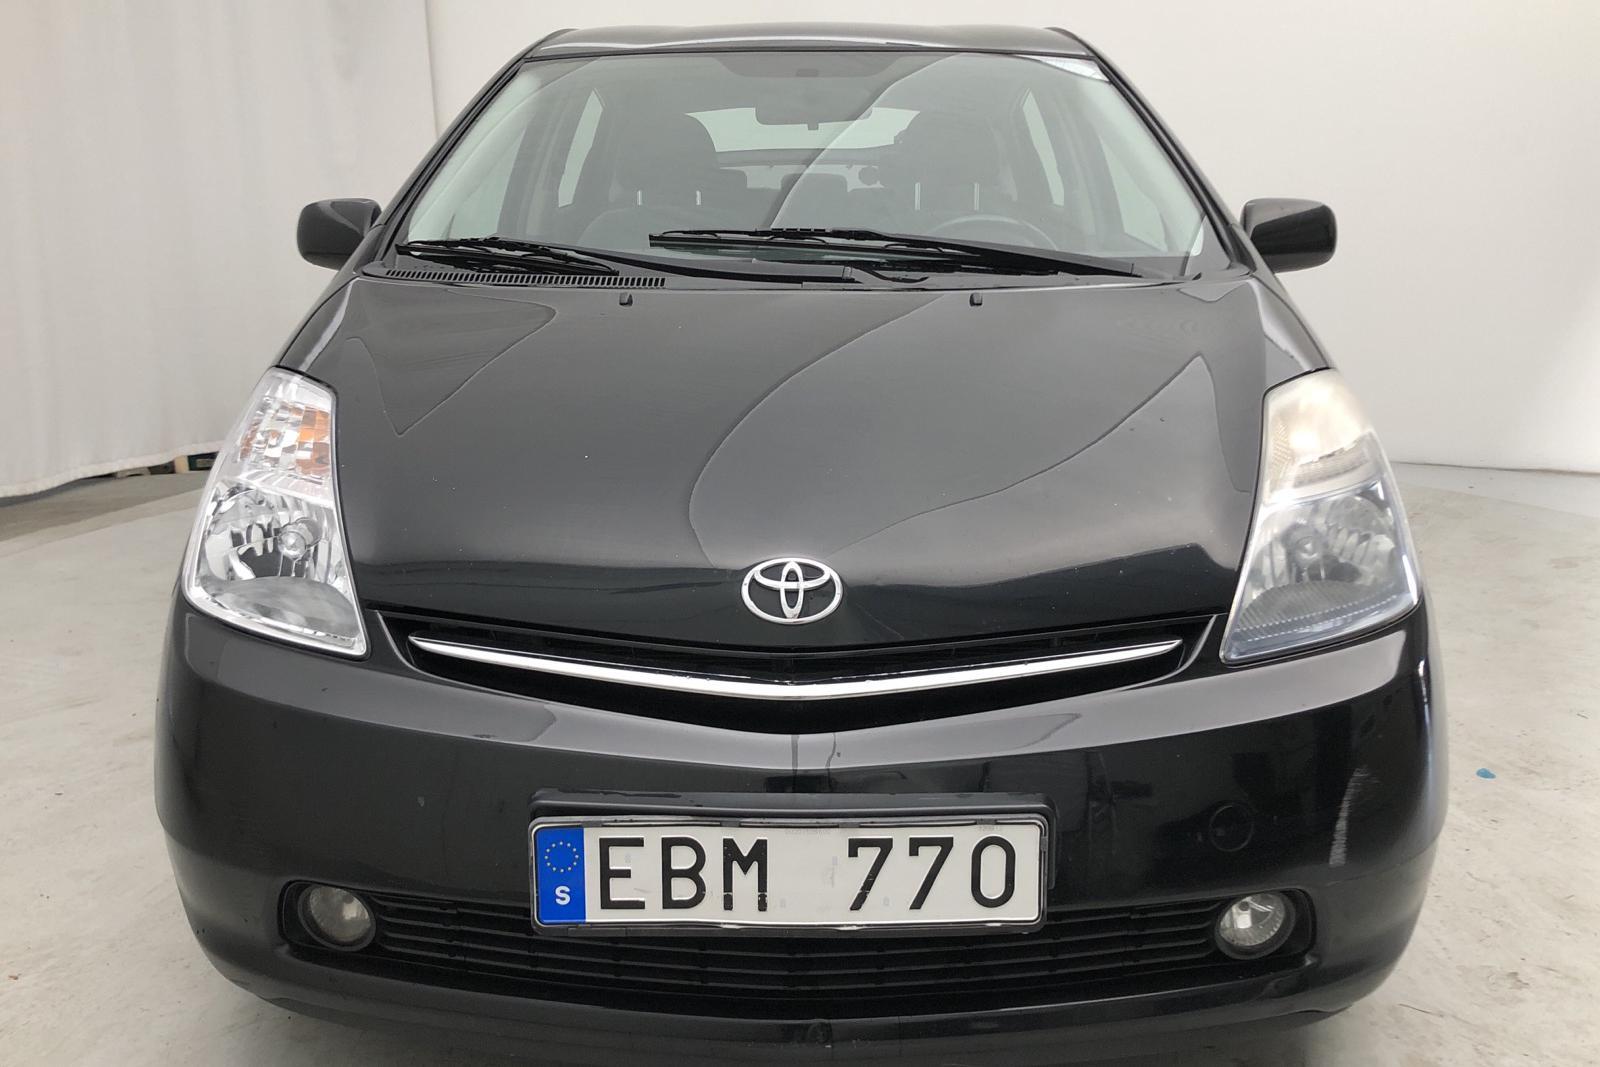 Toyota Prius 1.5 Hybrid (78hk) - 19 800 mil - Automat - svart - 2006